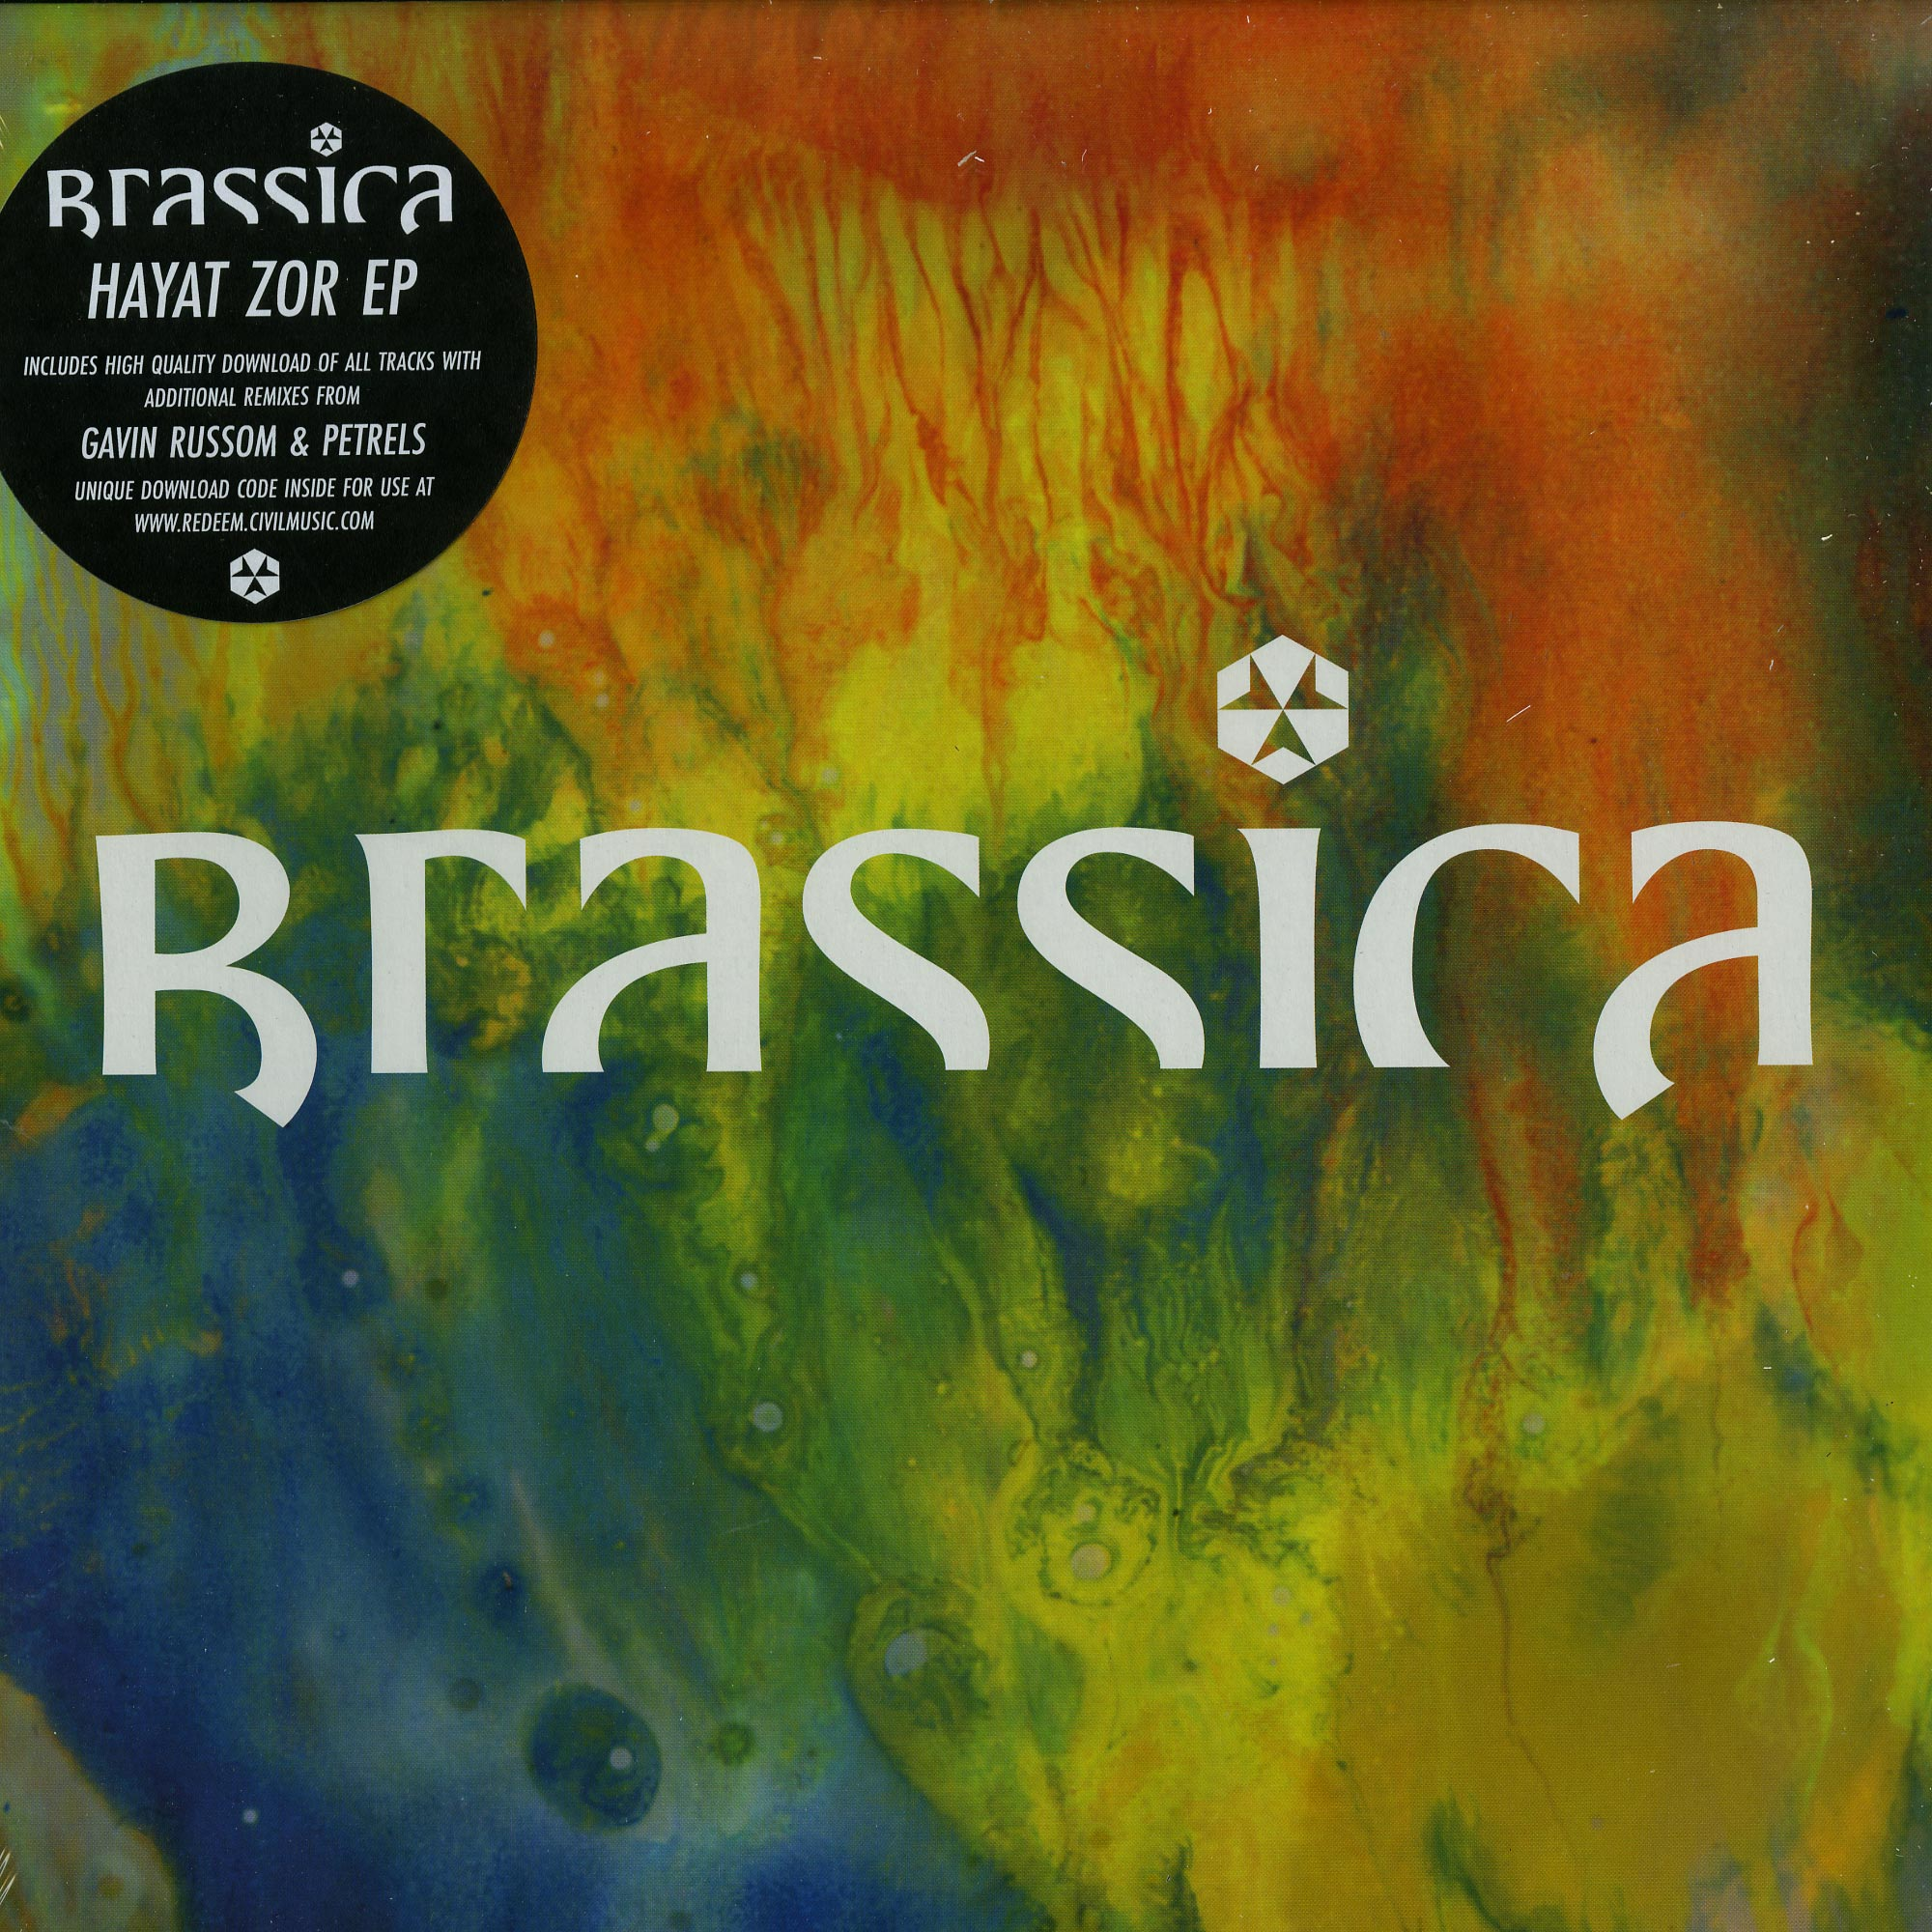 Brassica - HAYAT ZOR EP